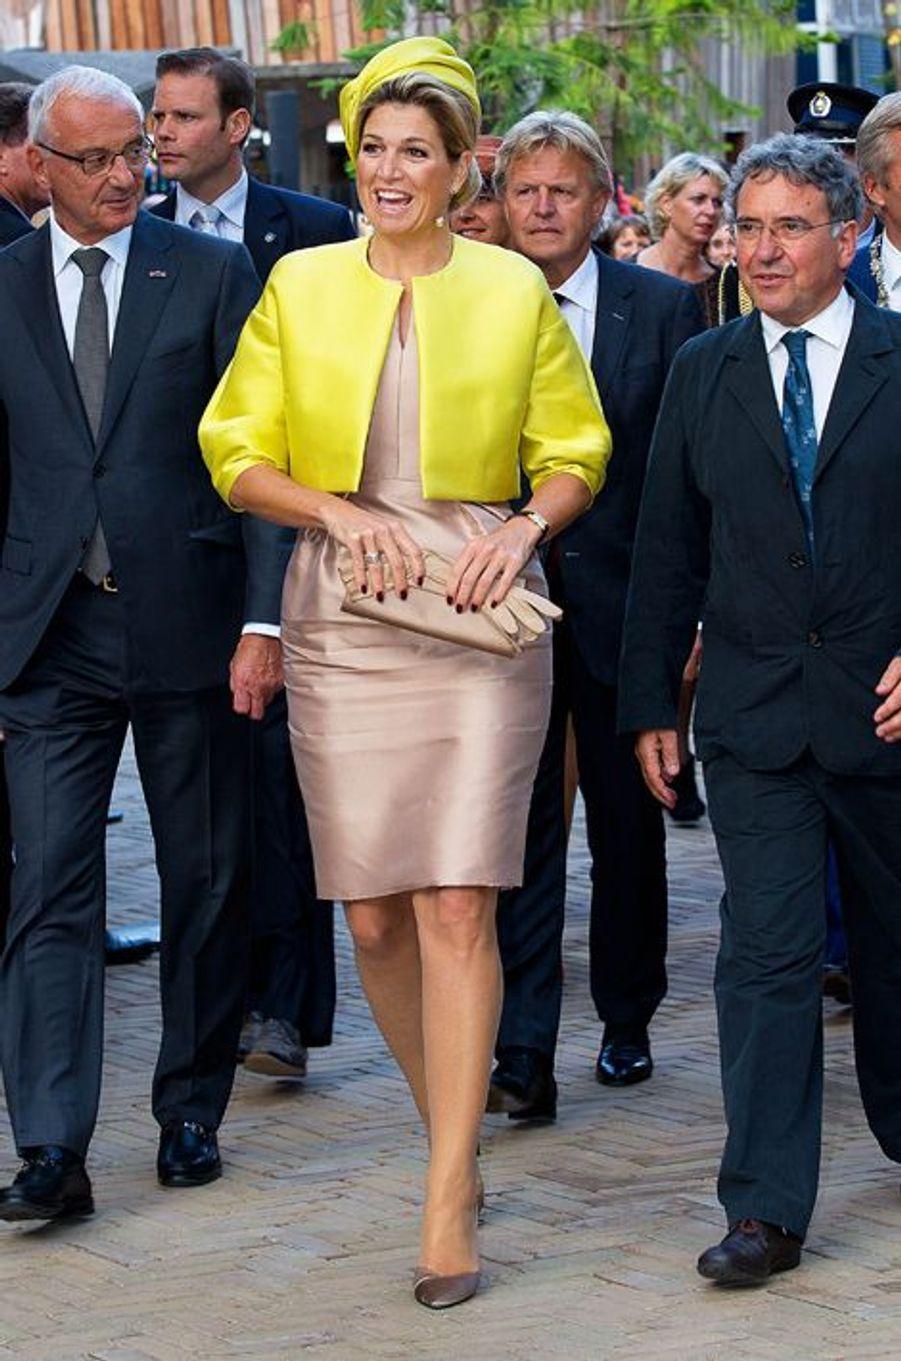 La reine Maxima des Pays-Bas inaugure Micropia à Amsterdam, le 30 septembre 2014